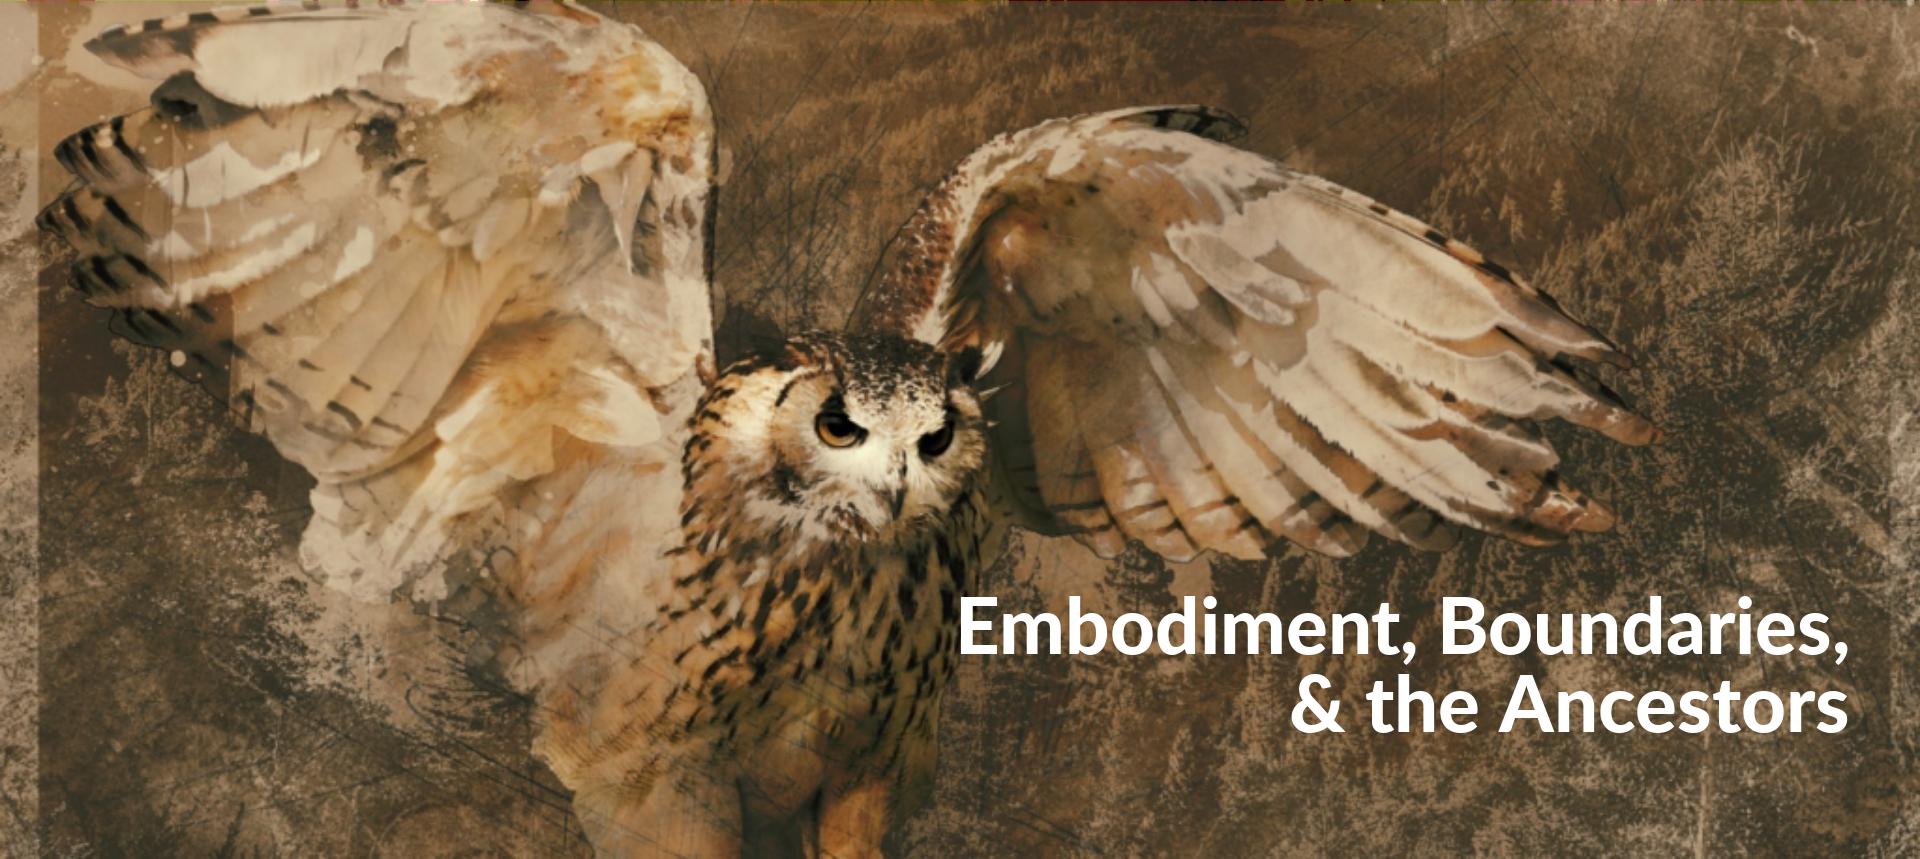 embodiment and boundaries